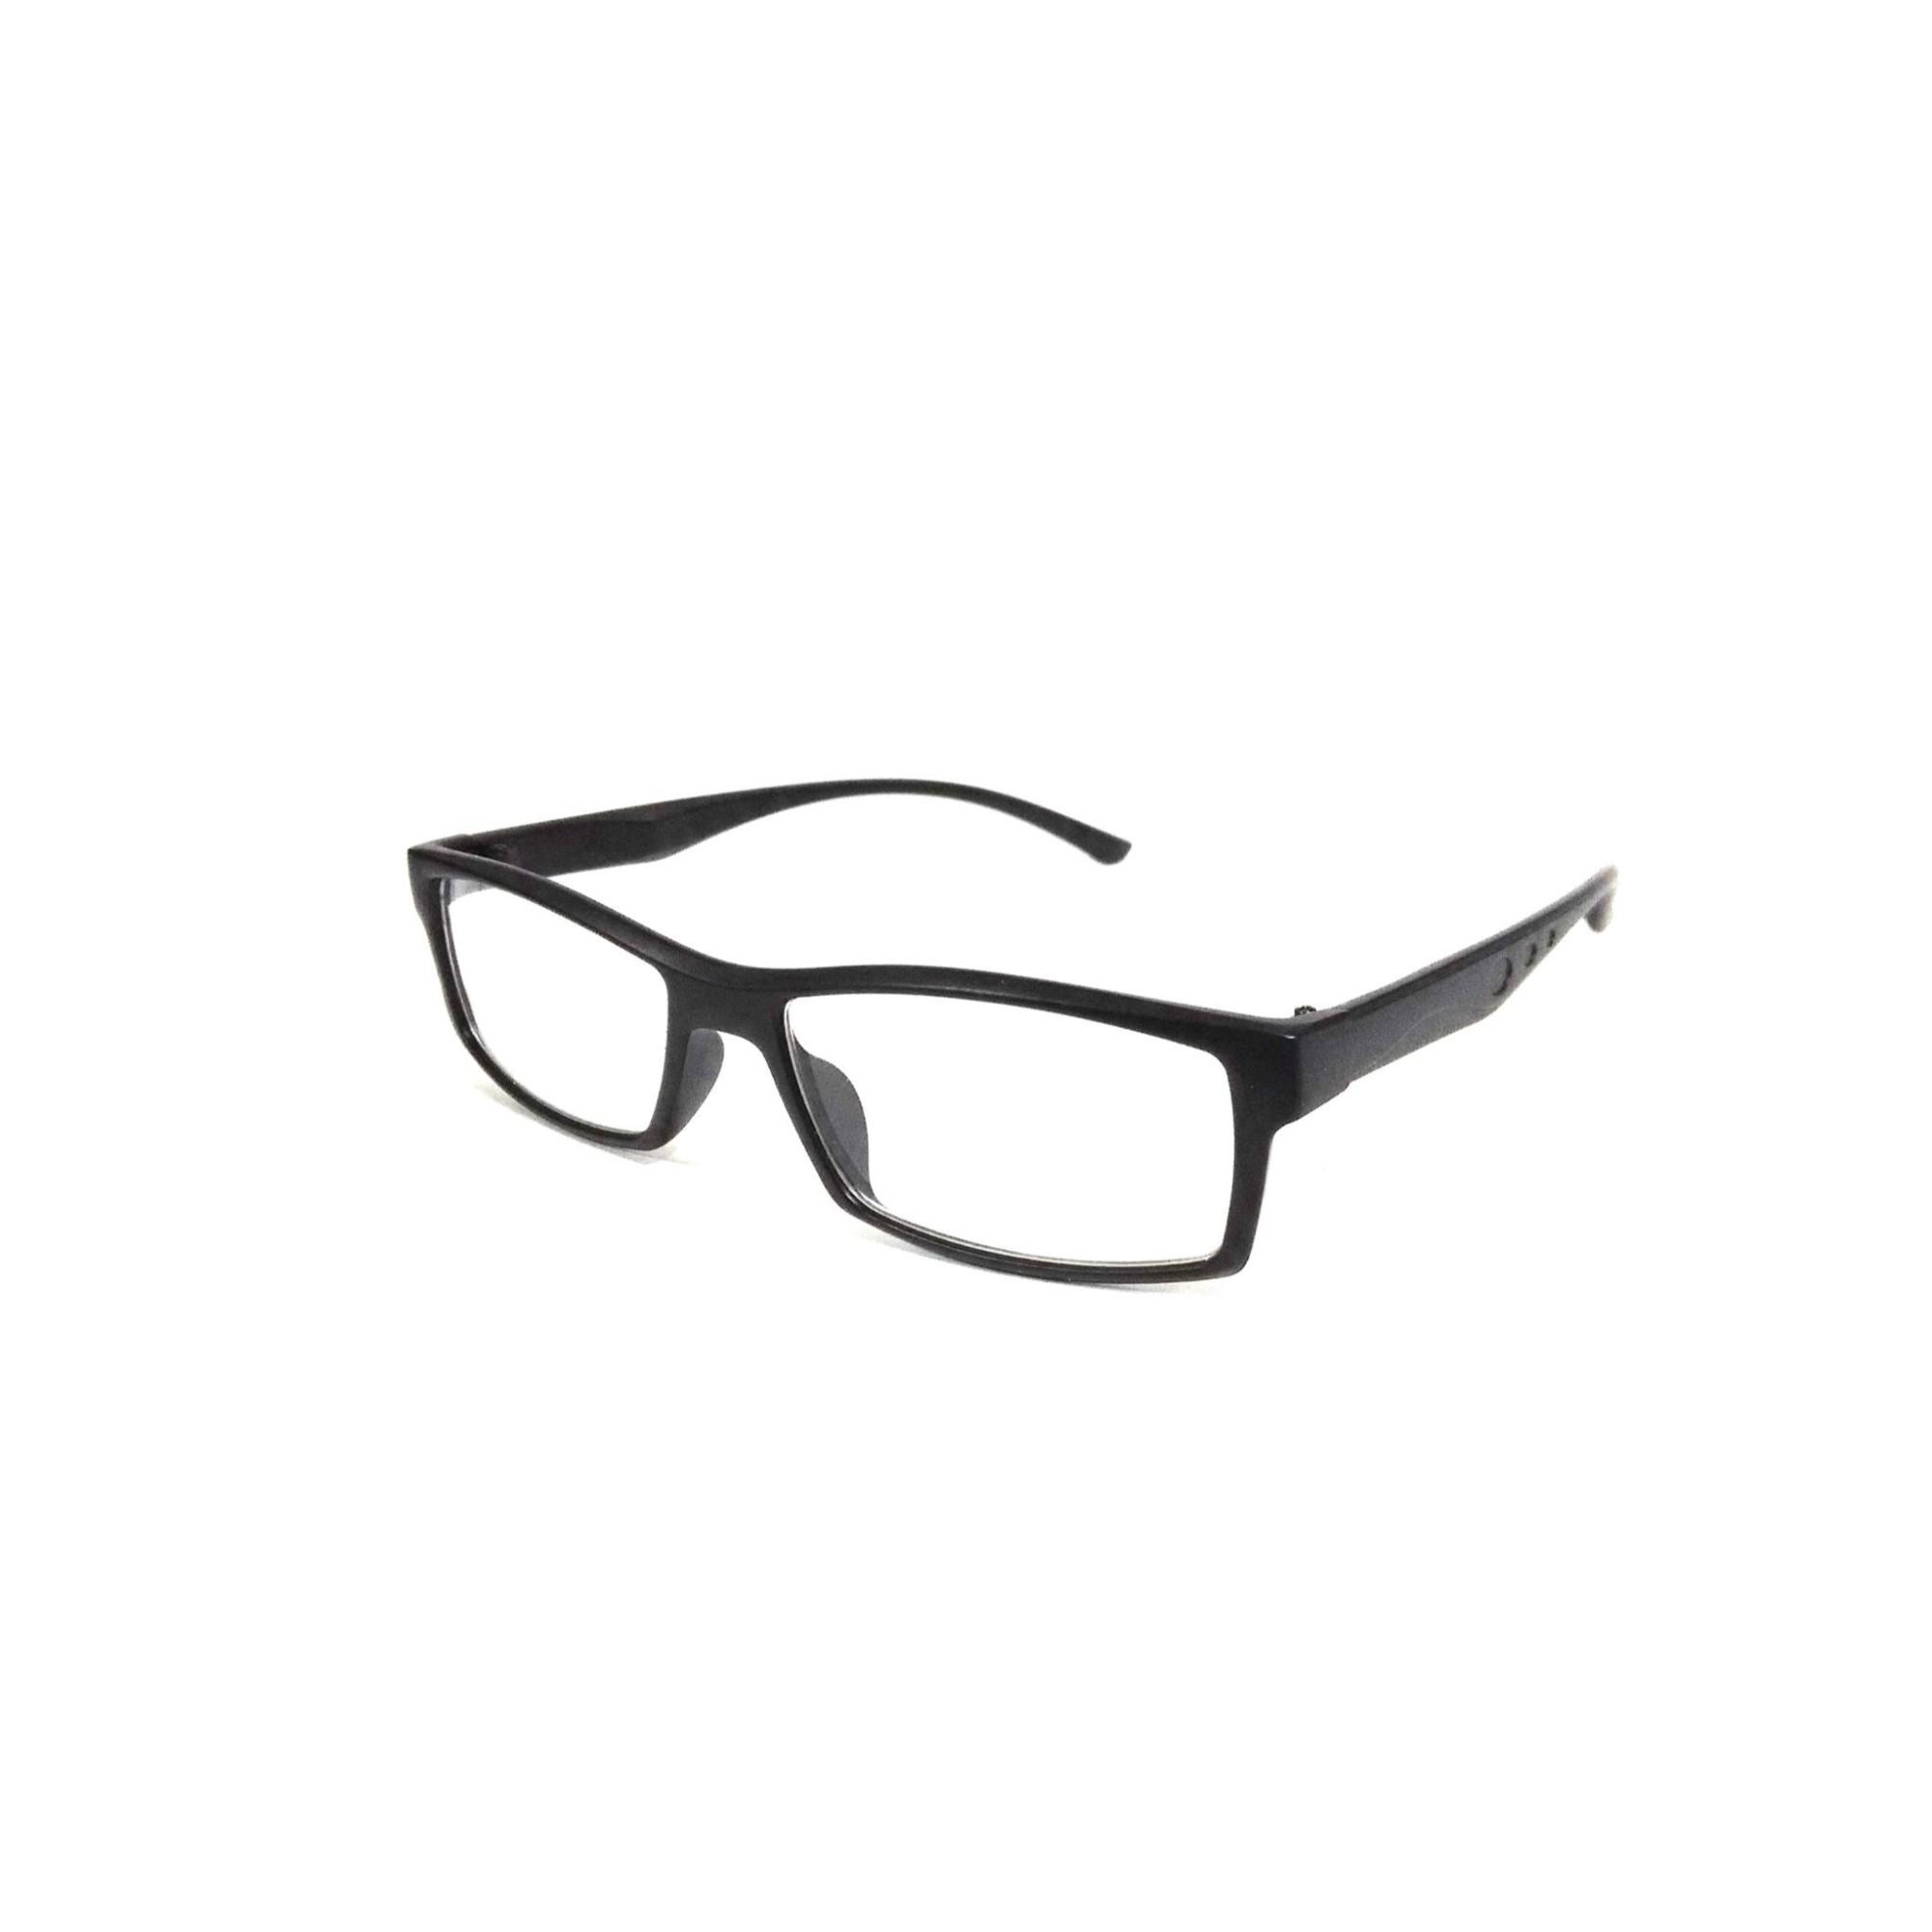 Blue Light Blocker Computer Glasses Anti Blue Ray Eyeglasses J023bk